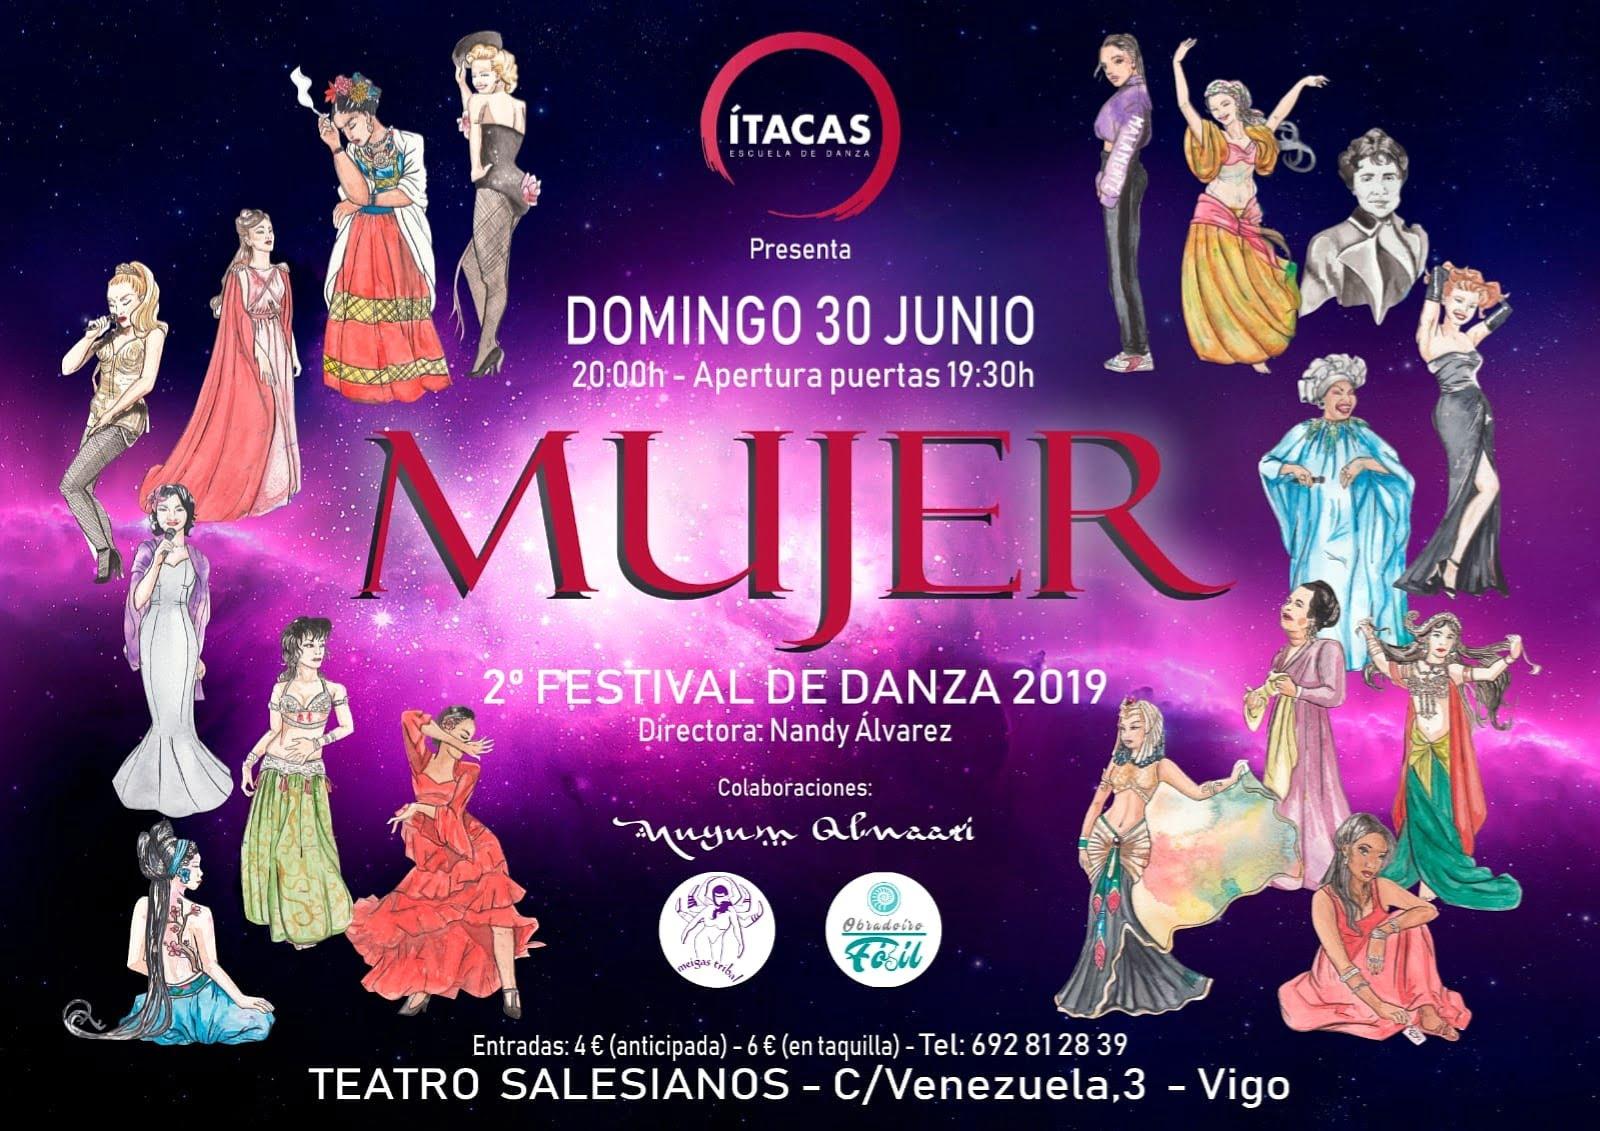 MUJER – 2° festival de danza ( Ítacas – Escuela de Danza)